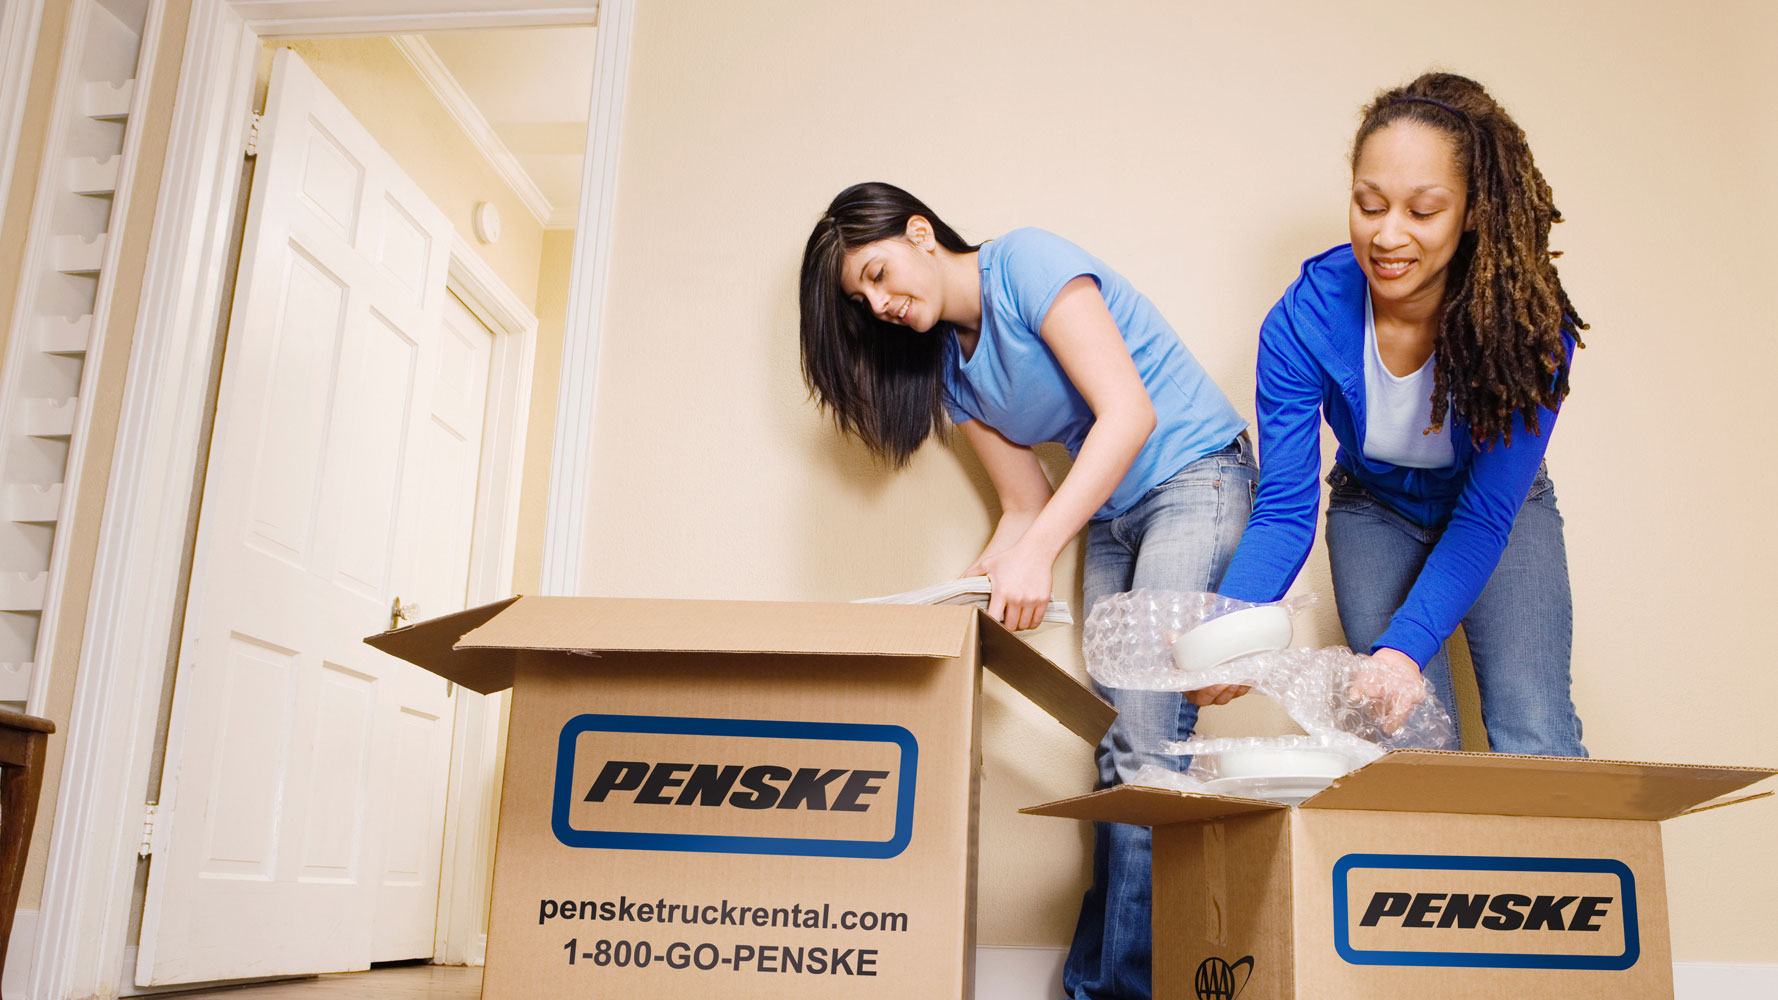 Penske Truck Rental 7399 Douglas Blvd Douglasville Ga 30135 Yp Com